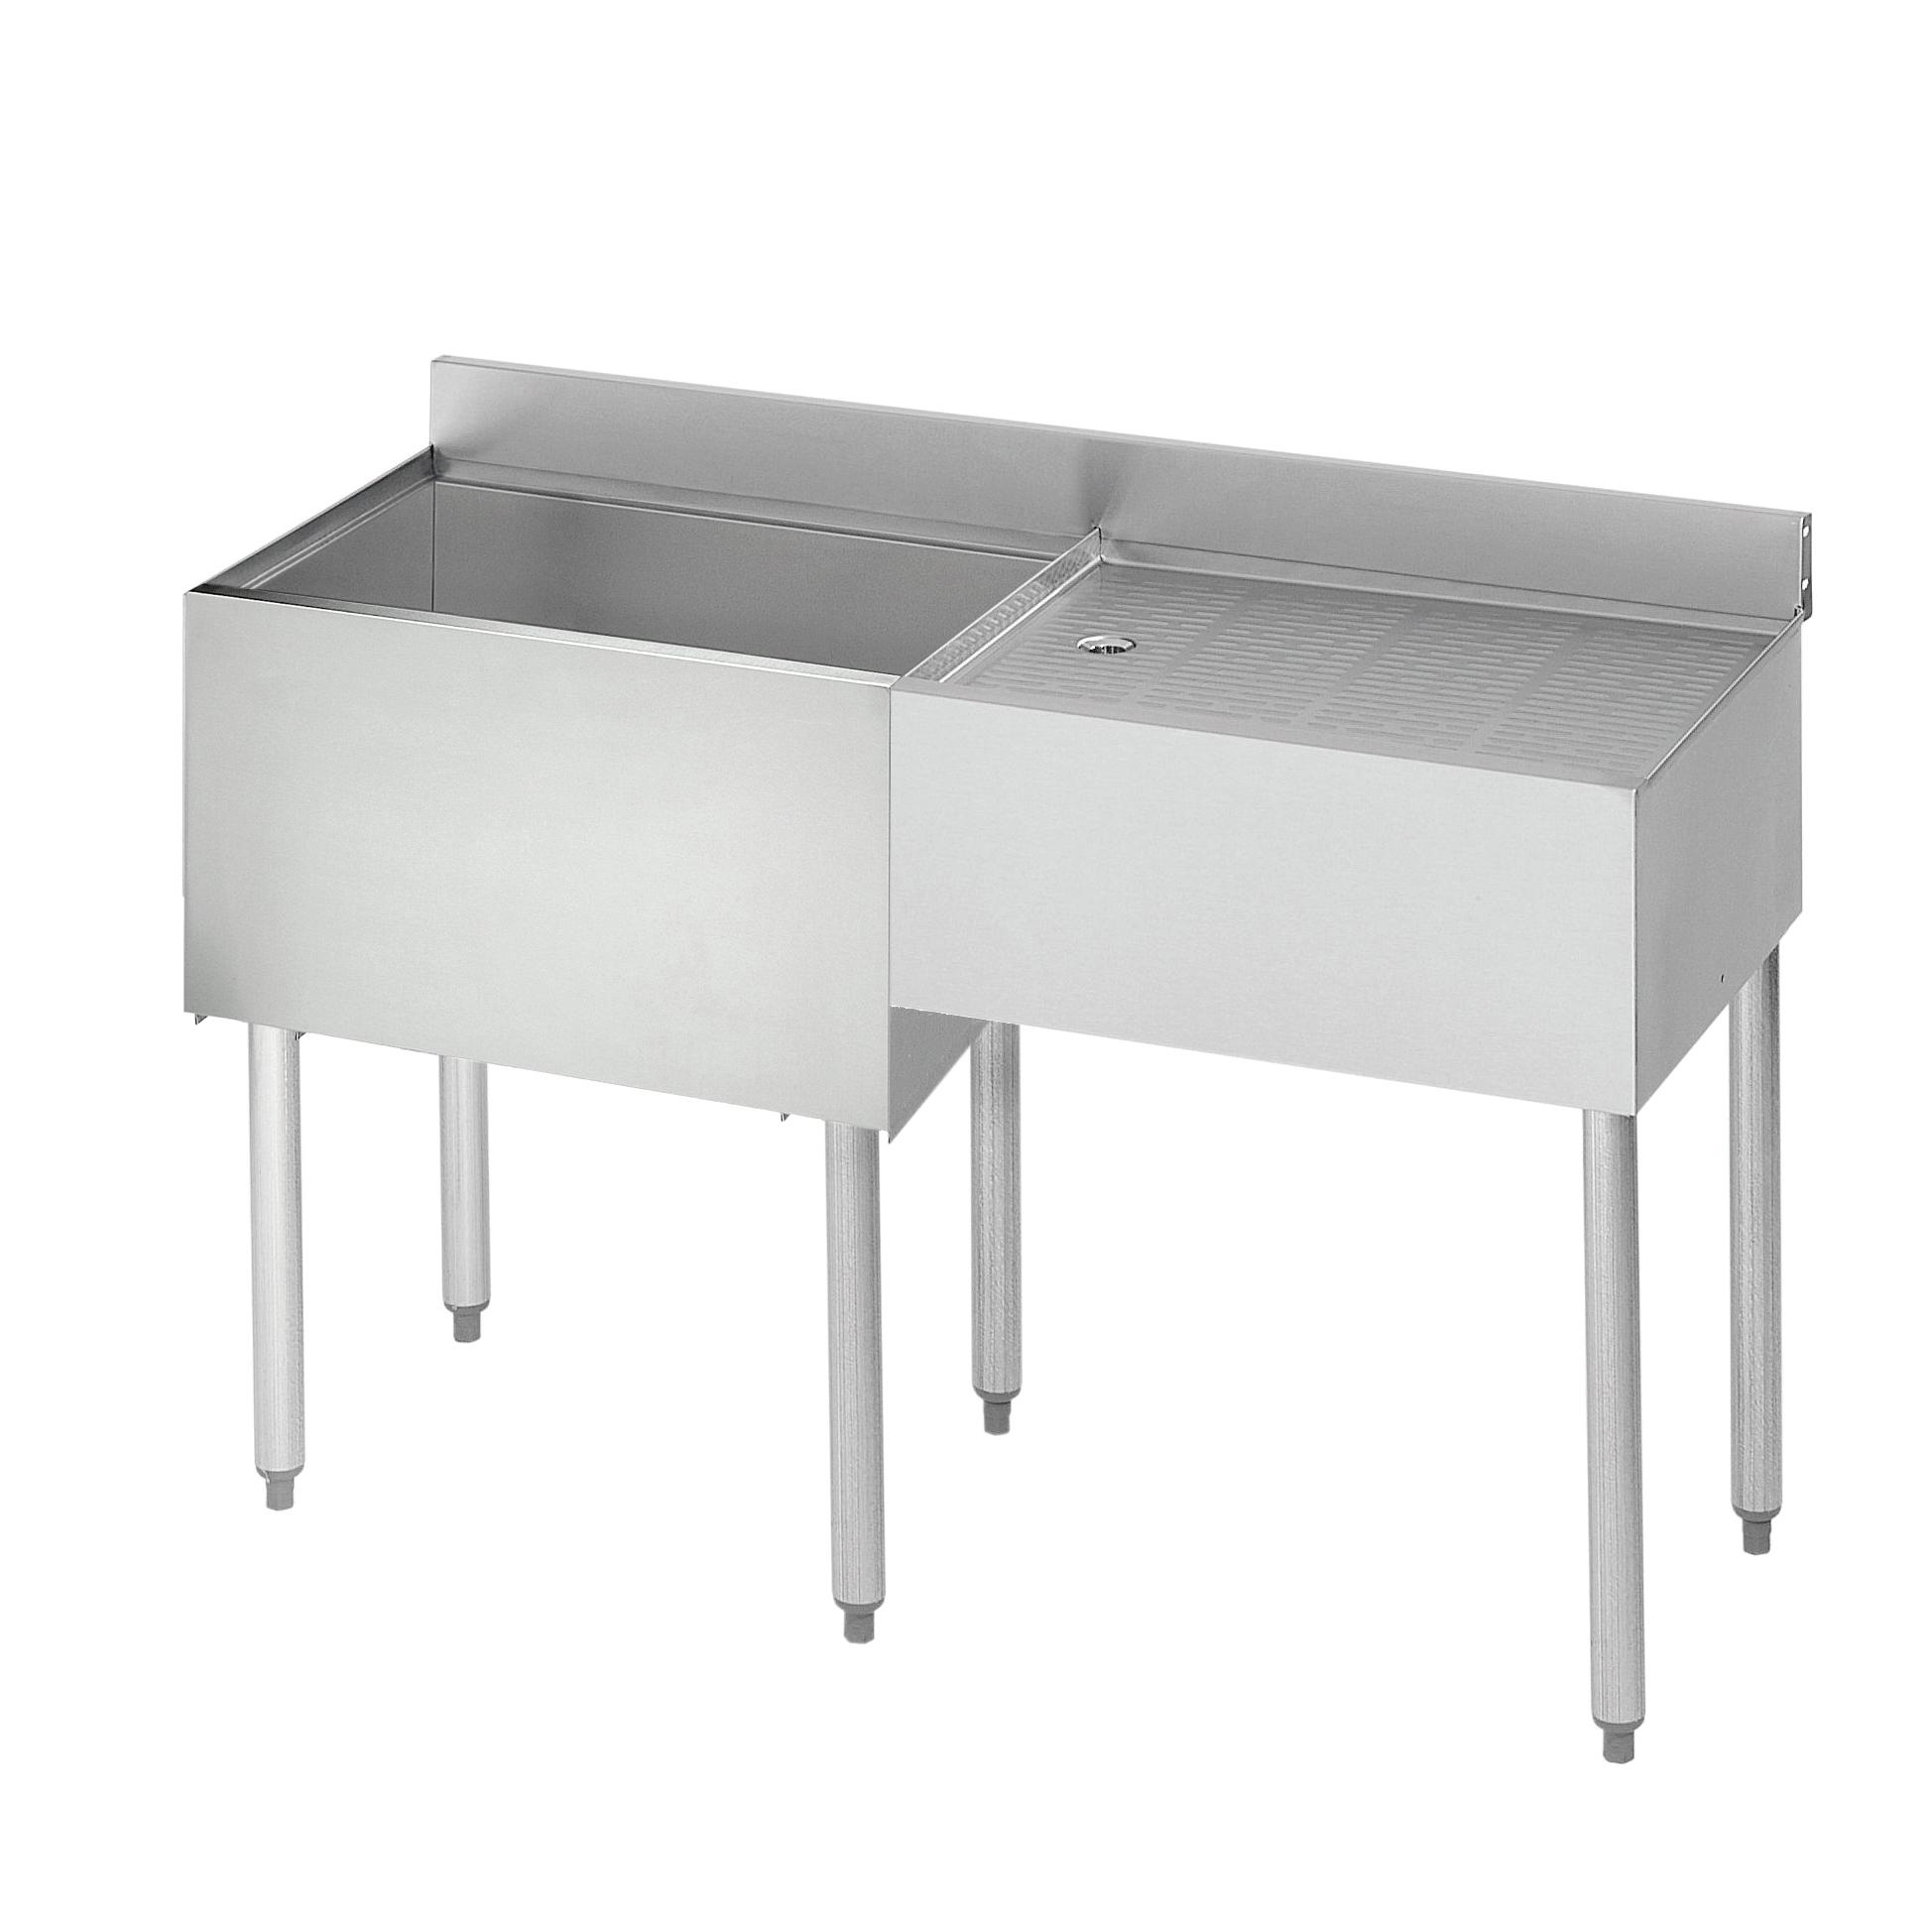 Krowne Metal 18-D48L ice bin